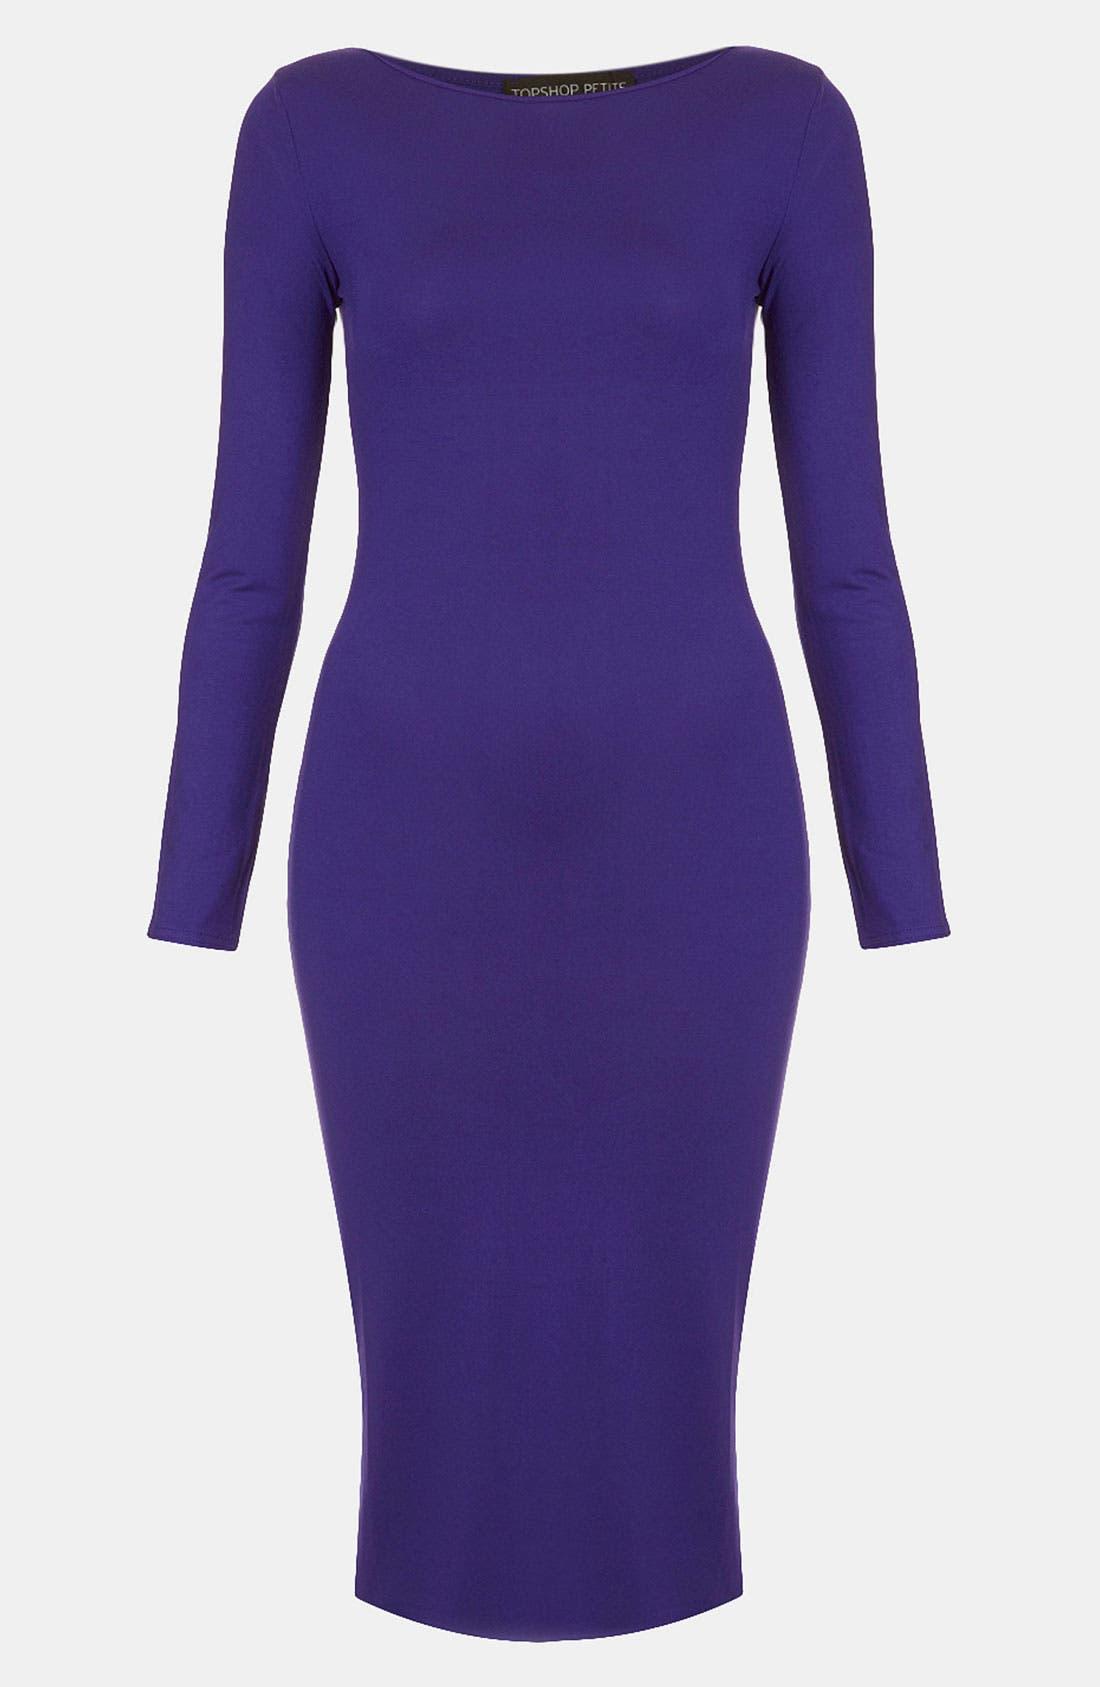 Alternate Image 1 Selected - Topshop Body-Con Midi Dress (Petite)